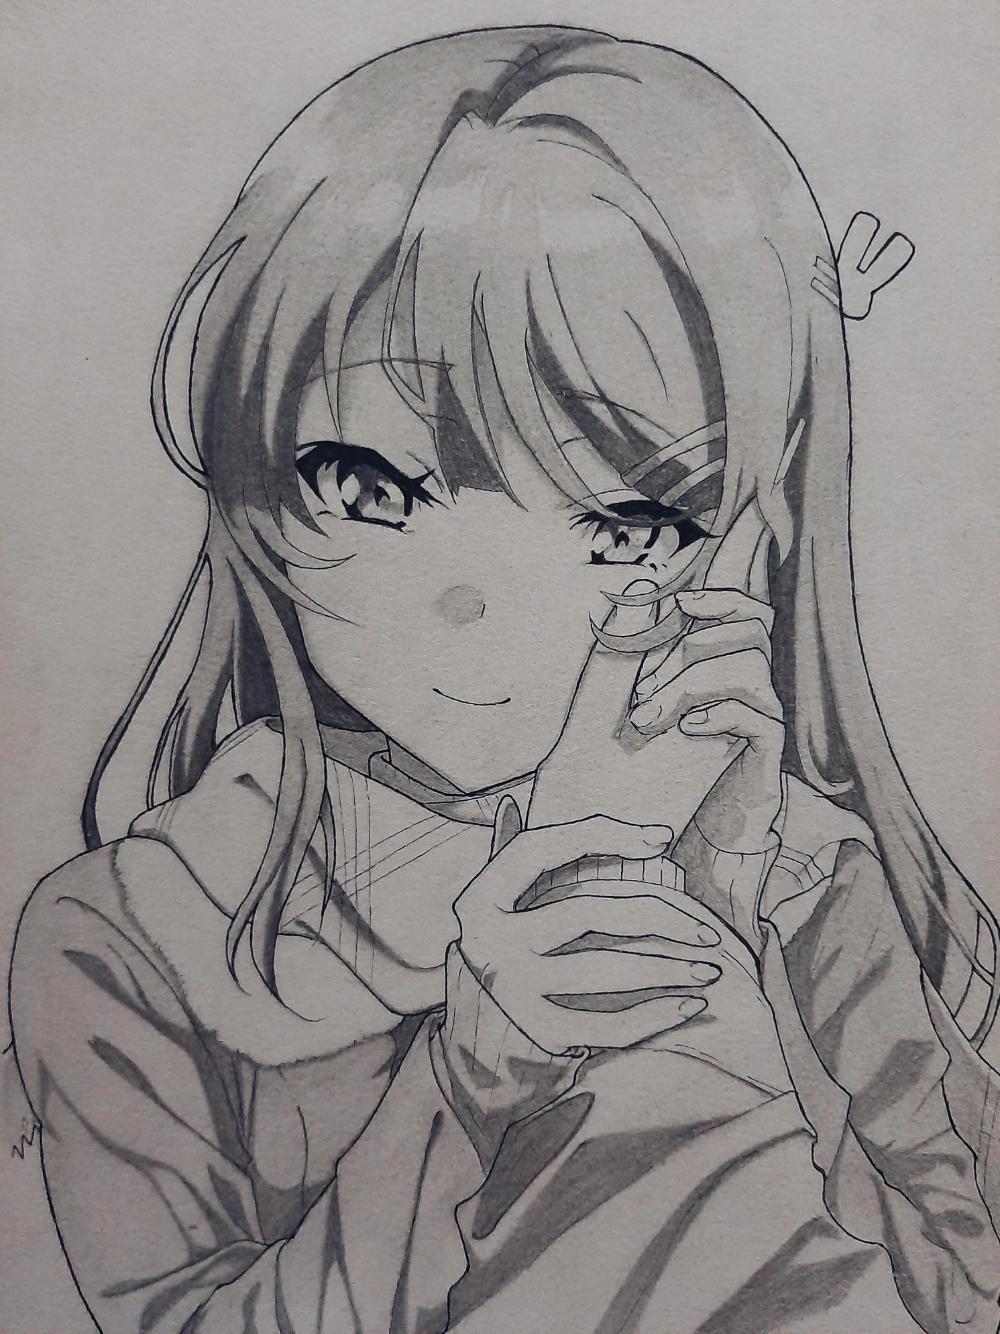 Mai Sakurajima from Rascal Does Not Dream of a Bunny Girl Senpai [reference used]